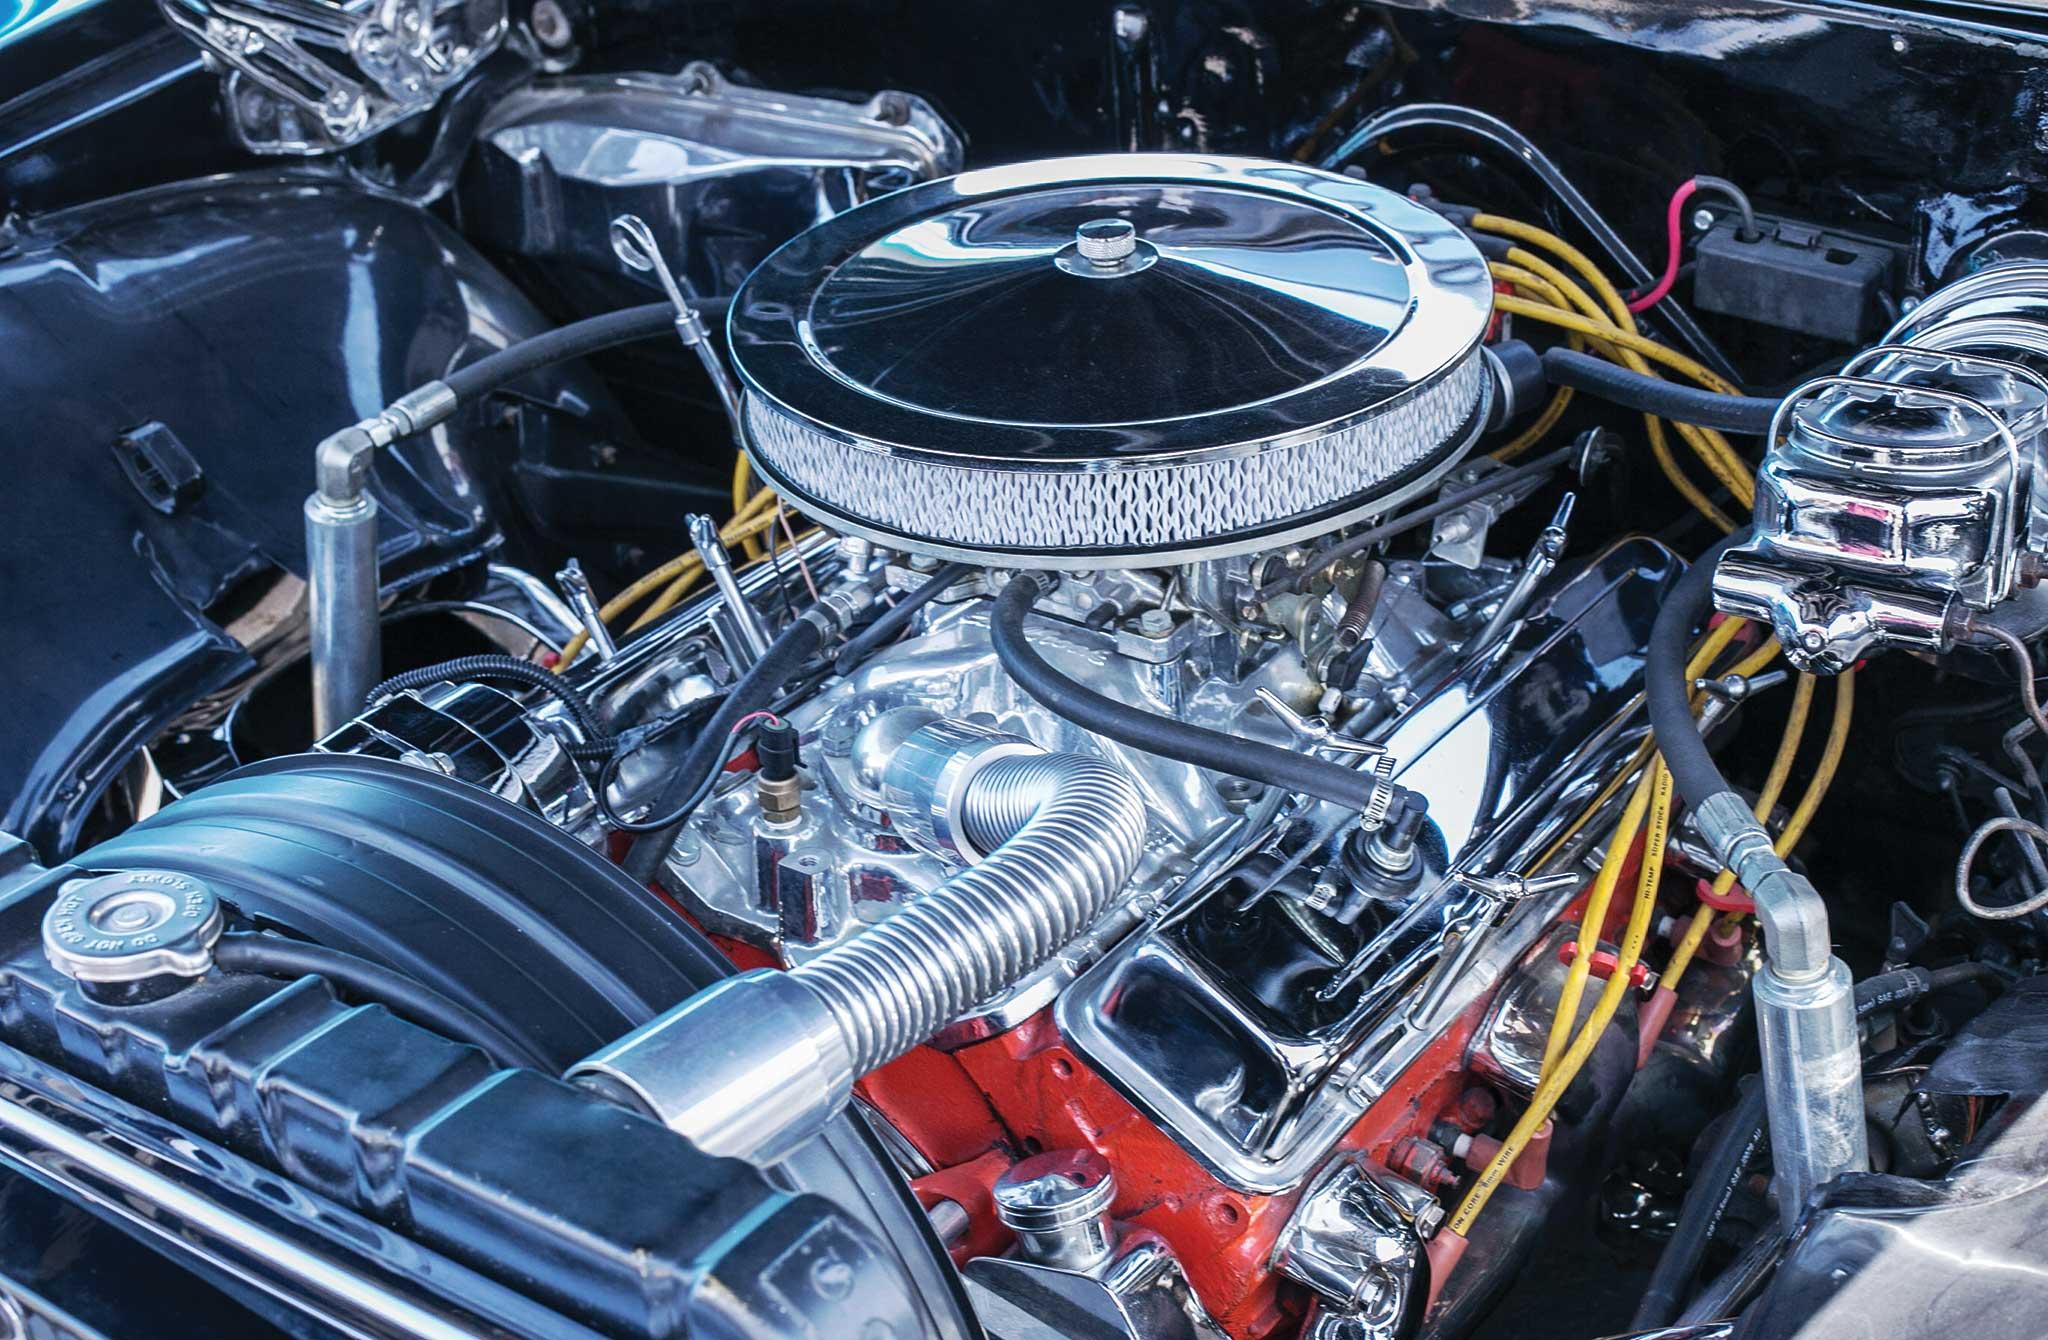 1967 Chevrolet Impala - Flashback Fastback - Lowrider